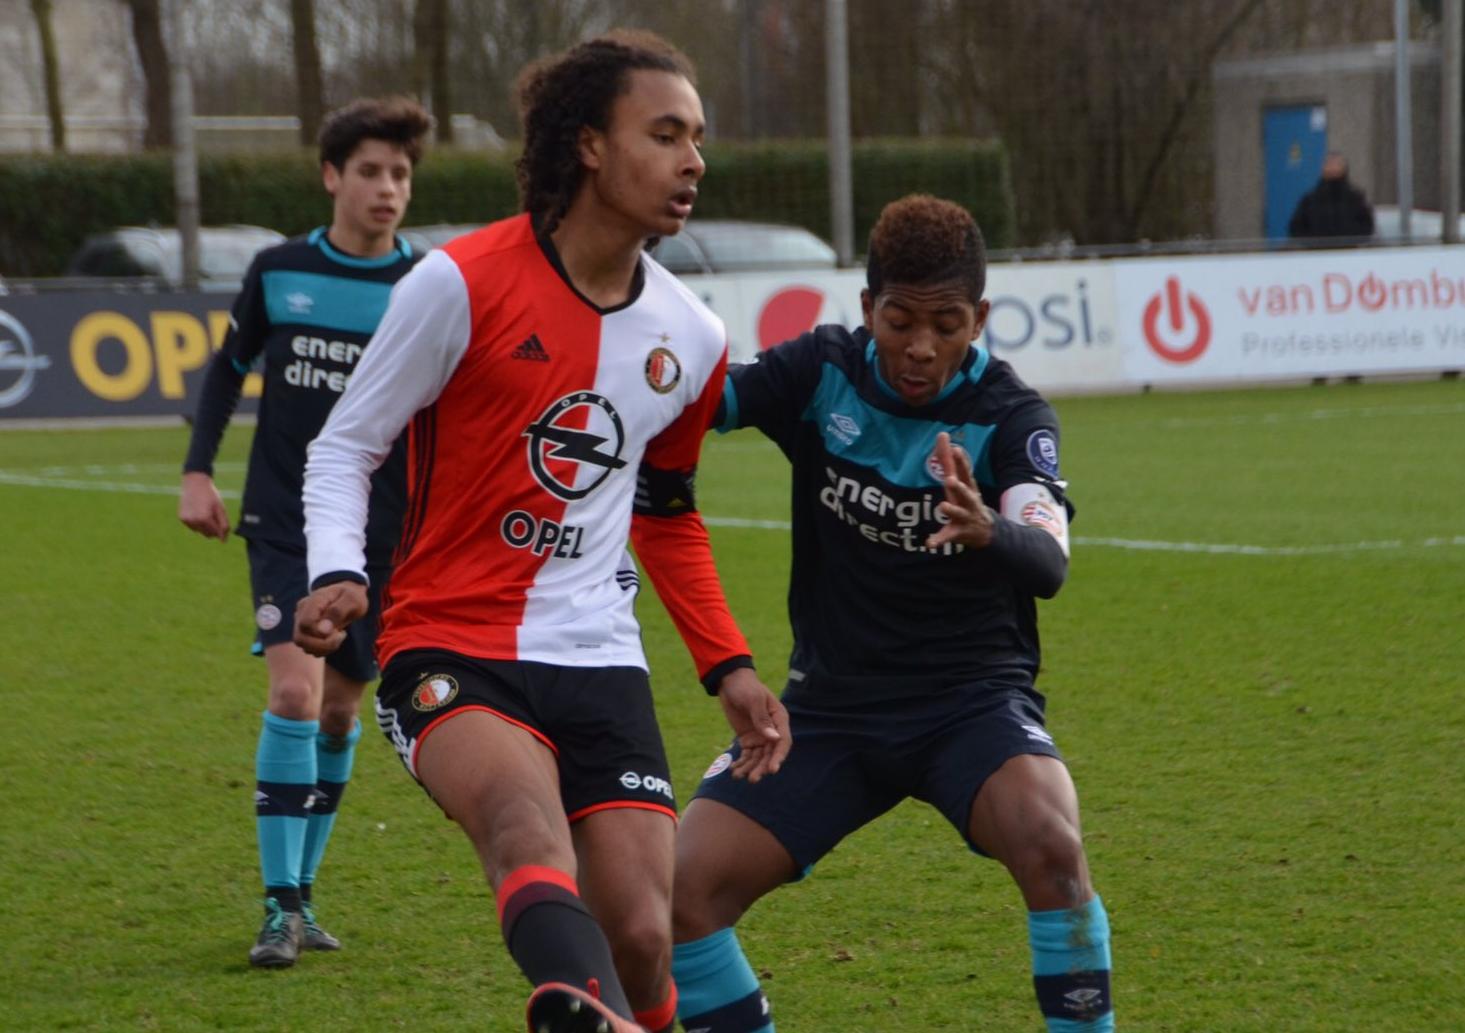 Arsenal Close To Signing 16 Year Old Joshua Zirkzee